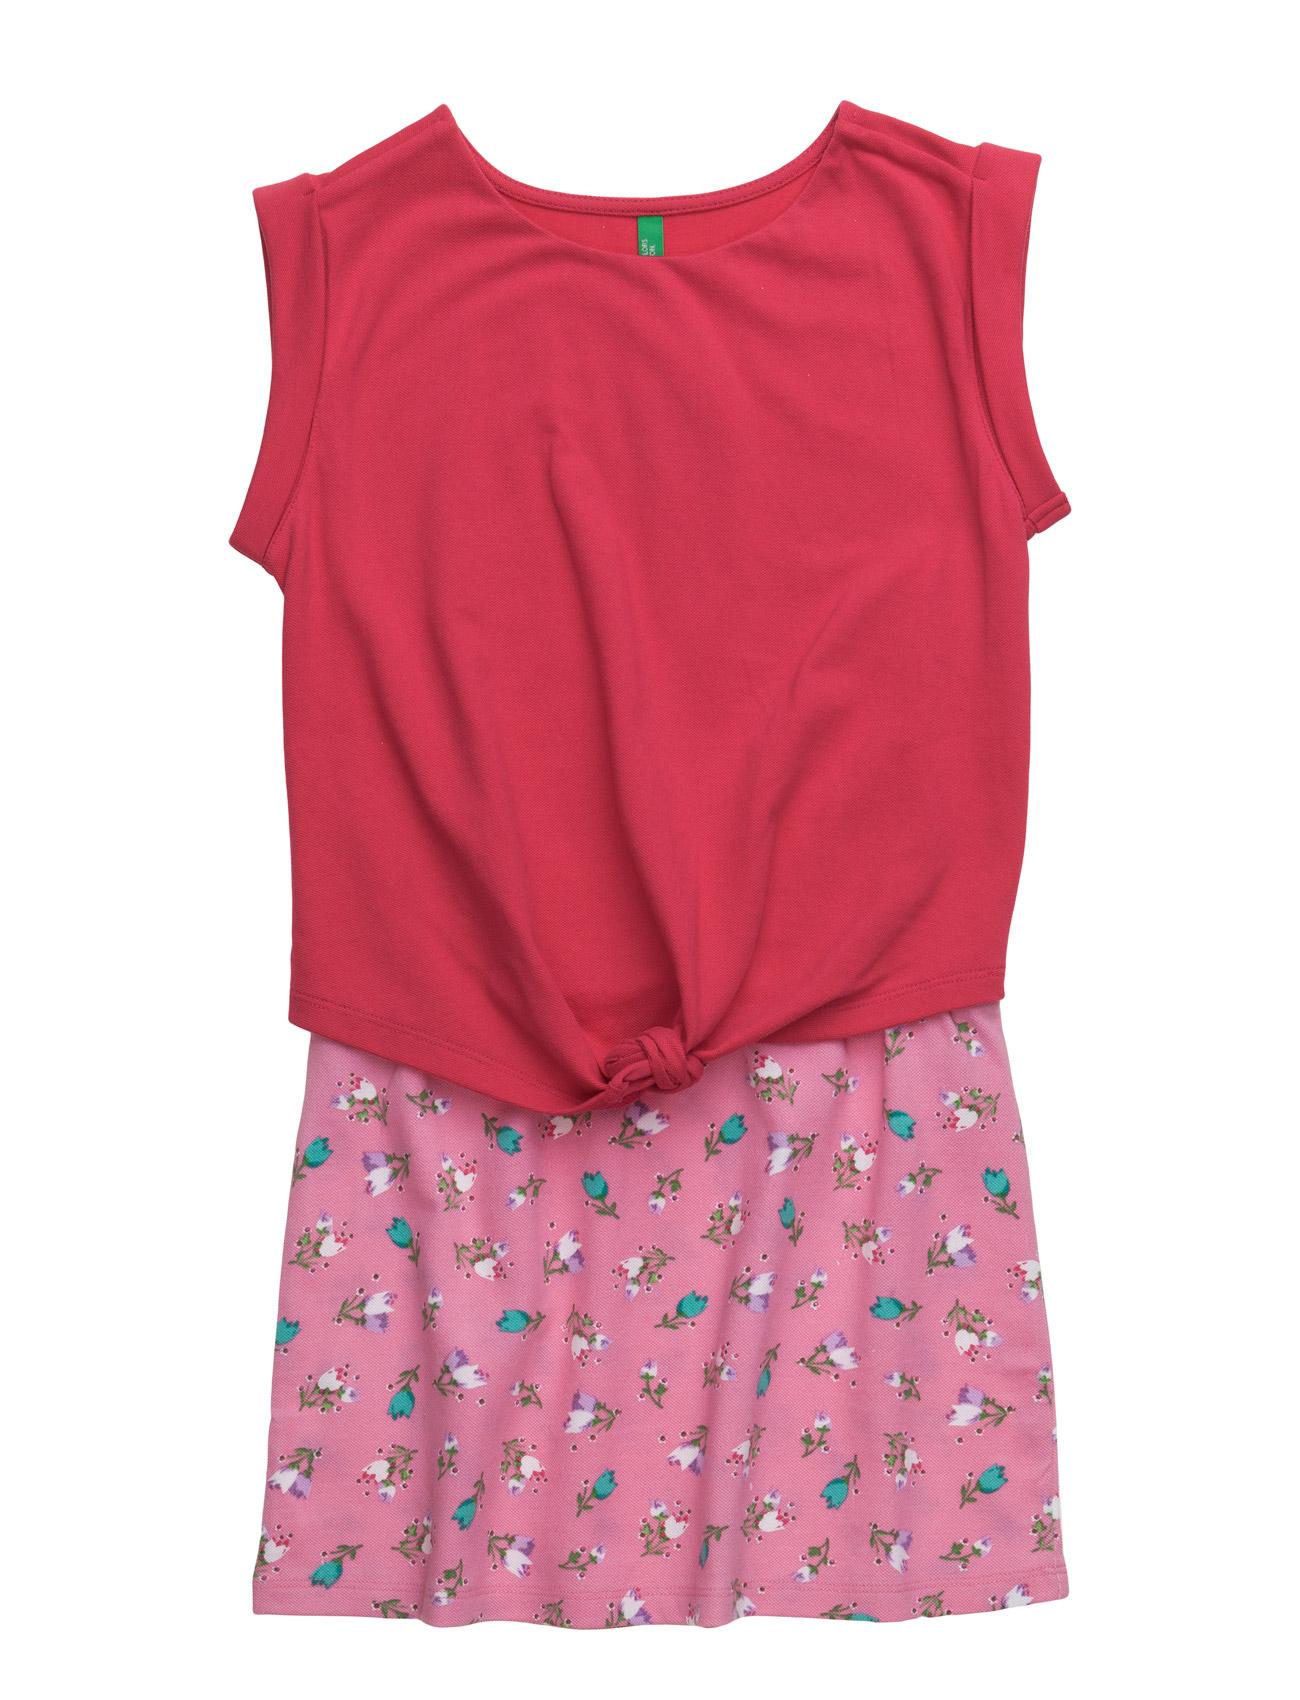 86f7c02384b0 Dress United Colors of Benetton Kjoler til Børn i Lyserød ...